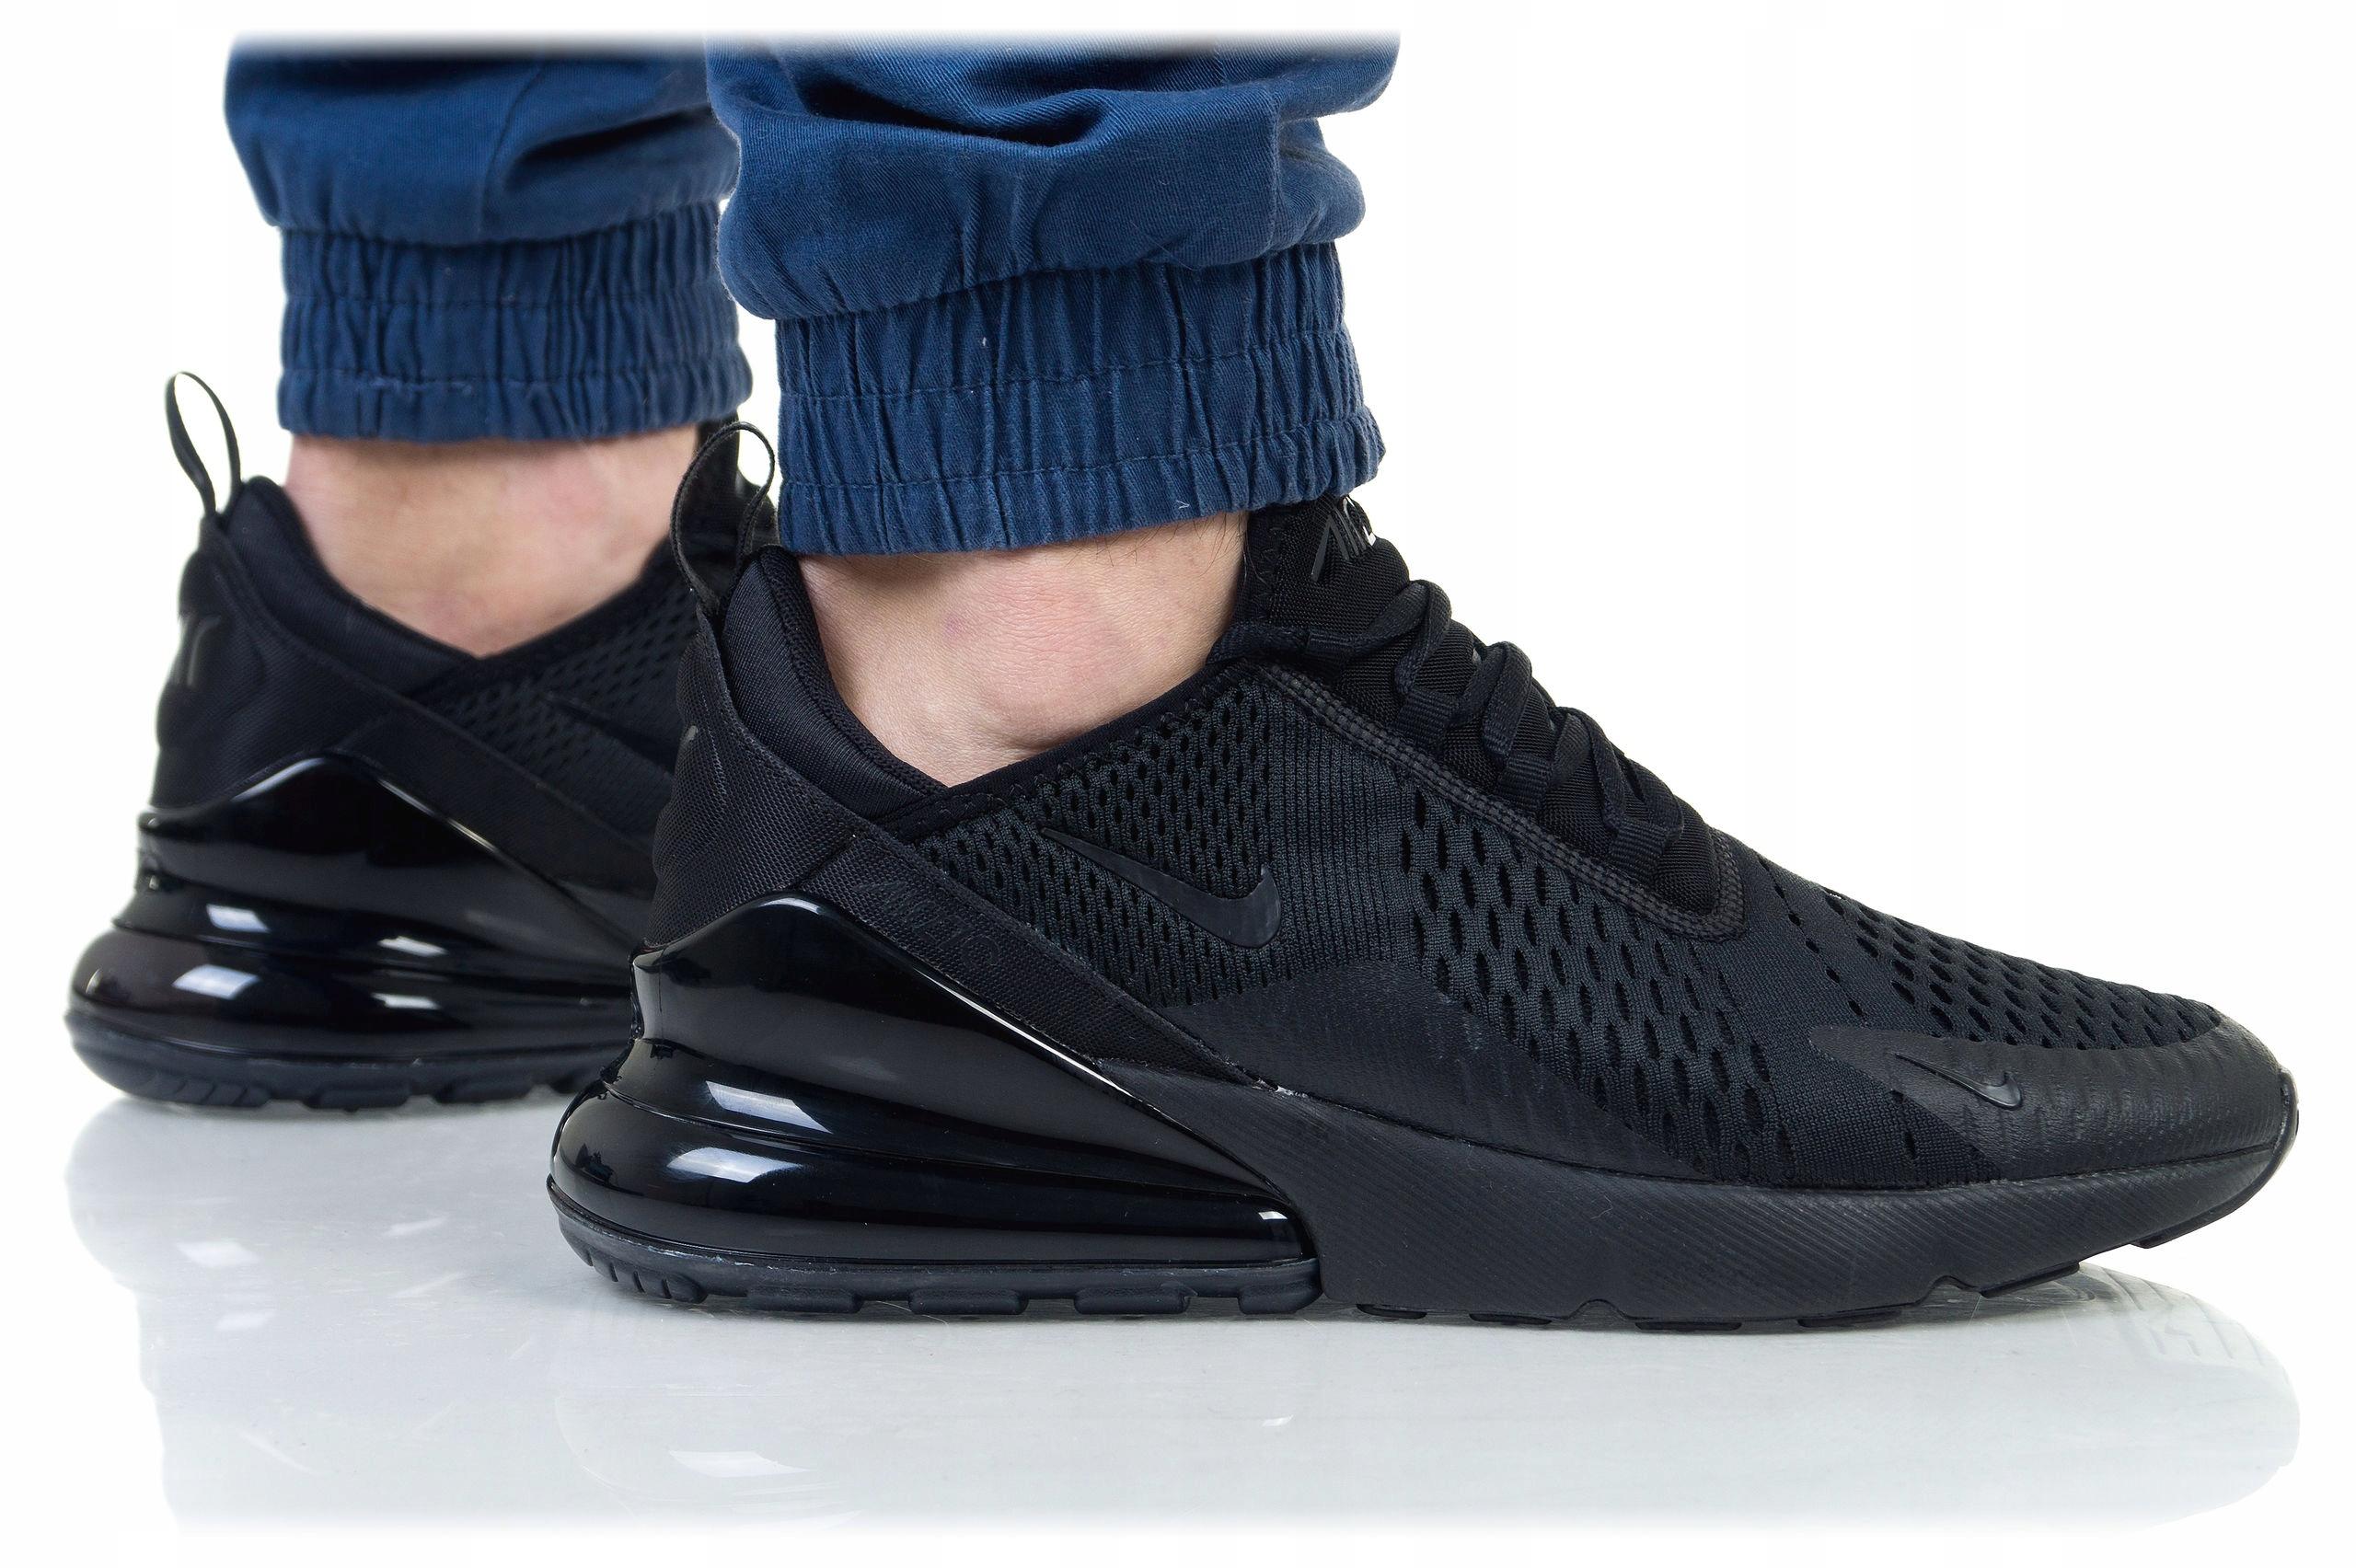 buty nike air max czarne Vendoria.pl